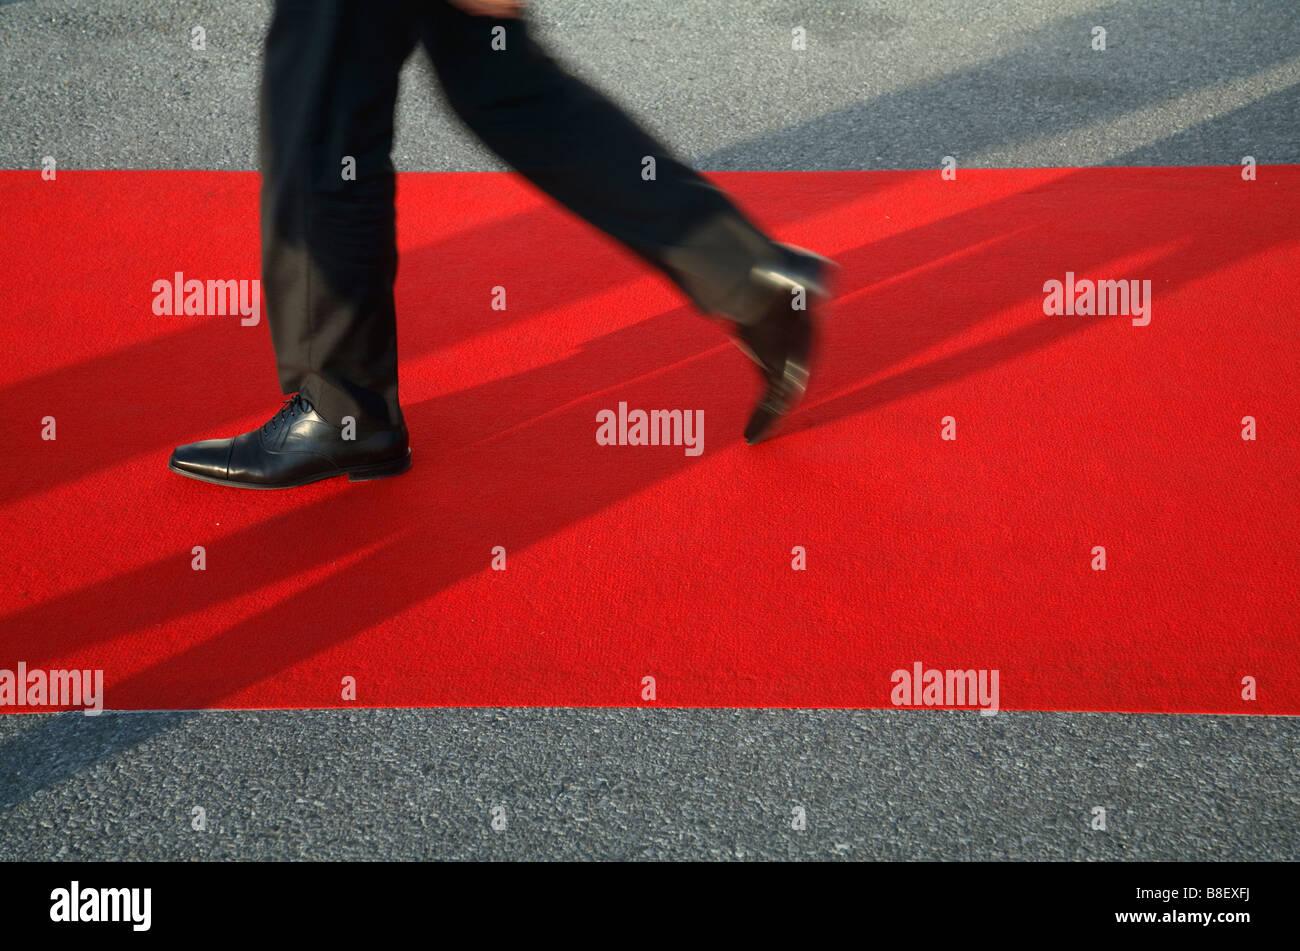 a of on carpet Stock man walking Legs Photo22455766 red 6b7yYfg